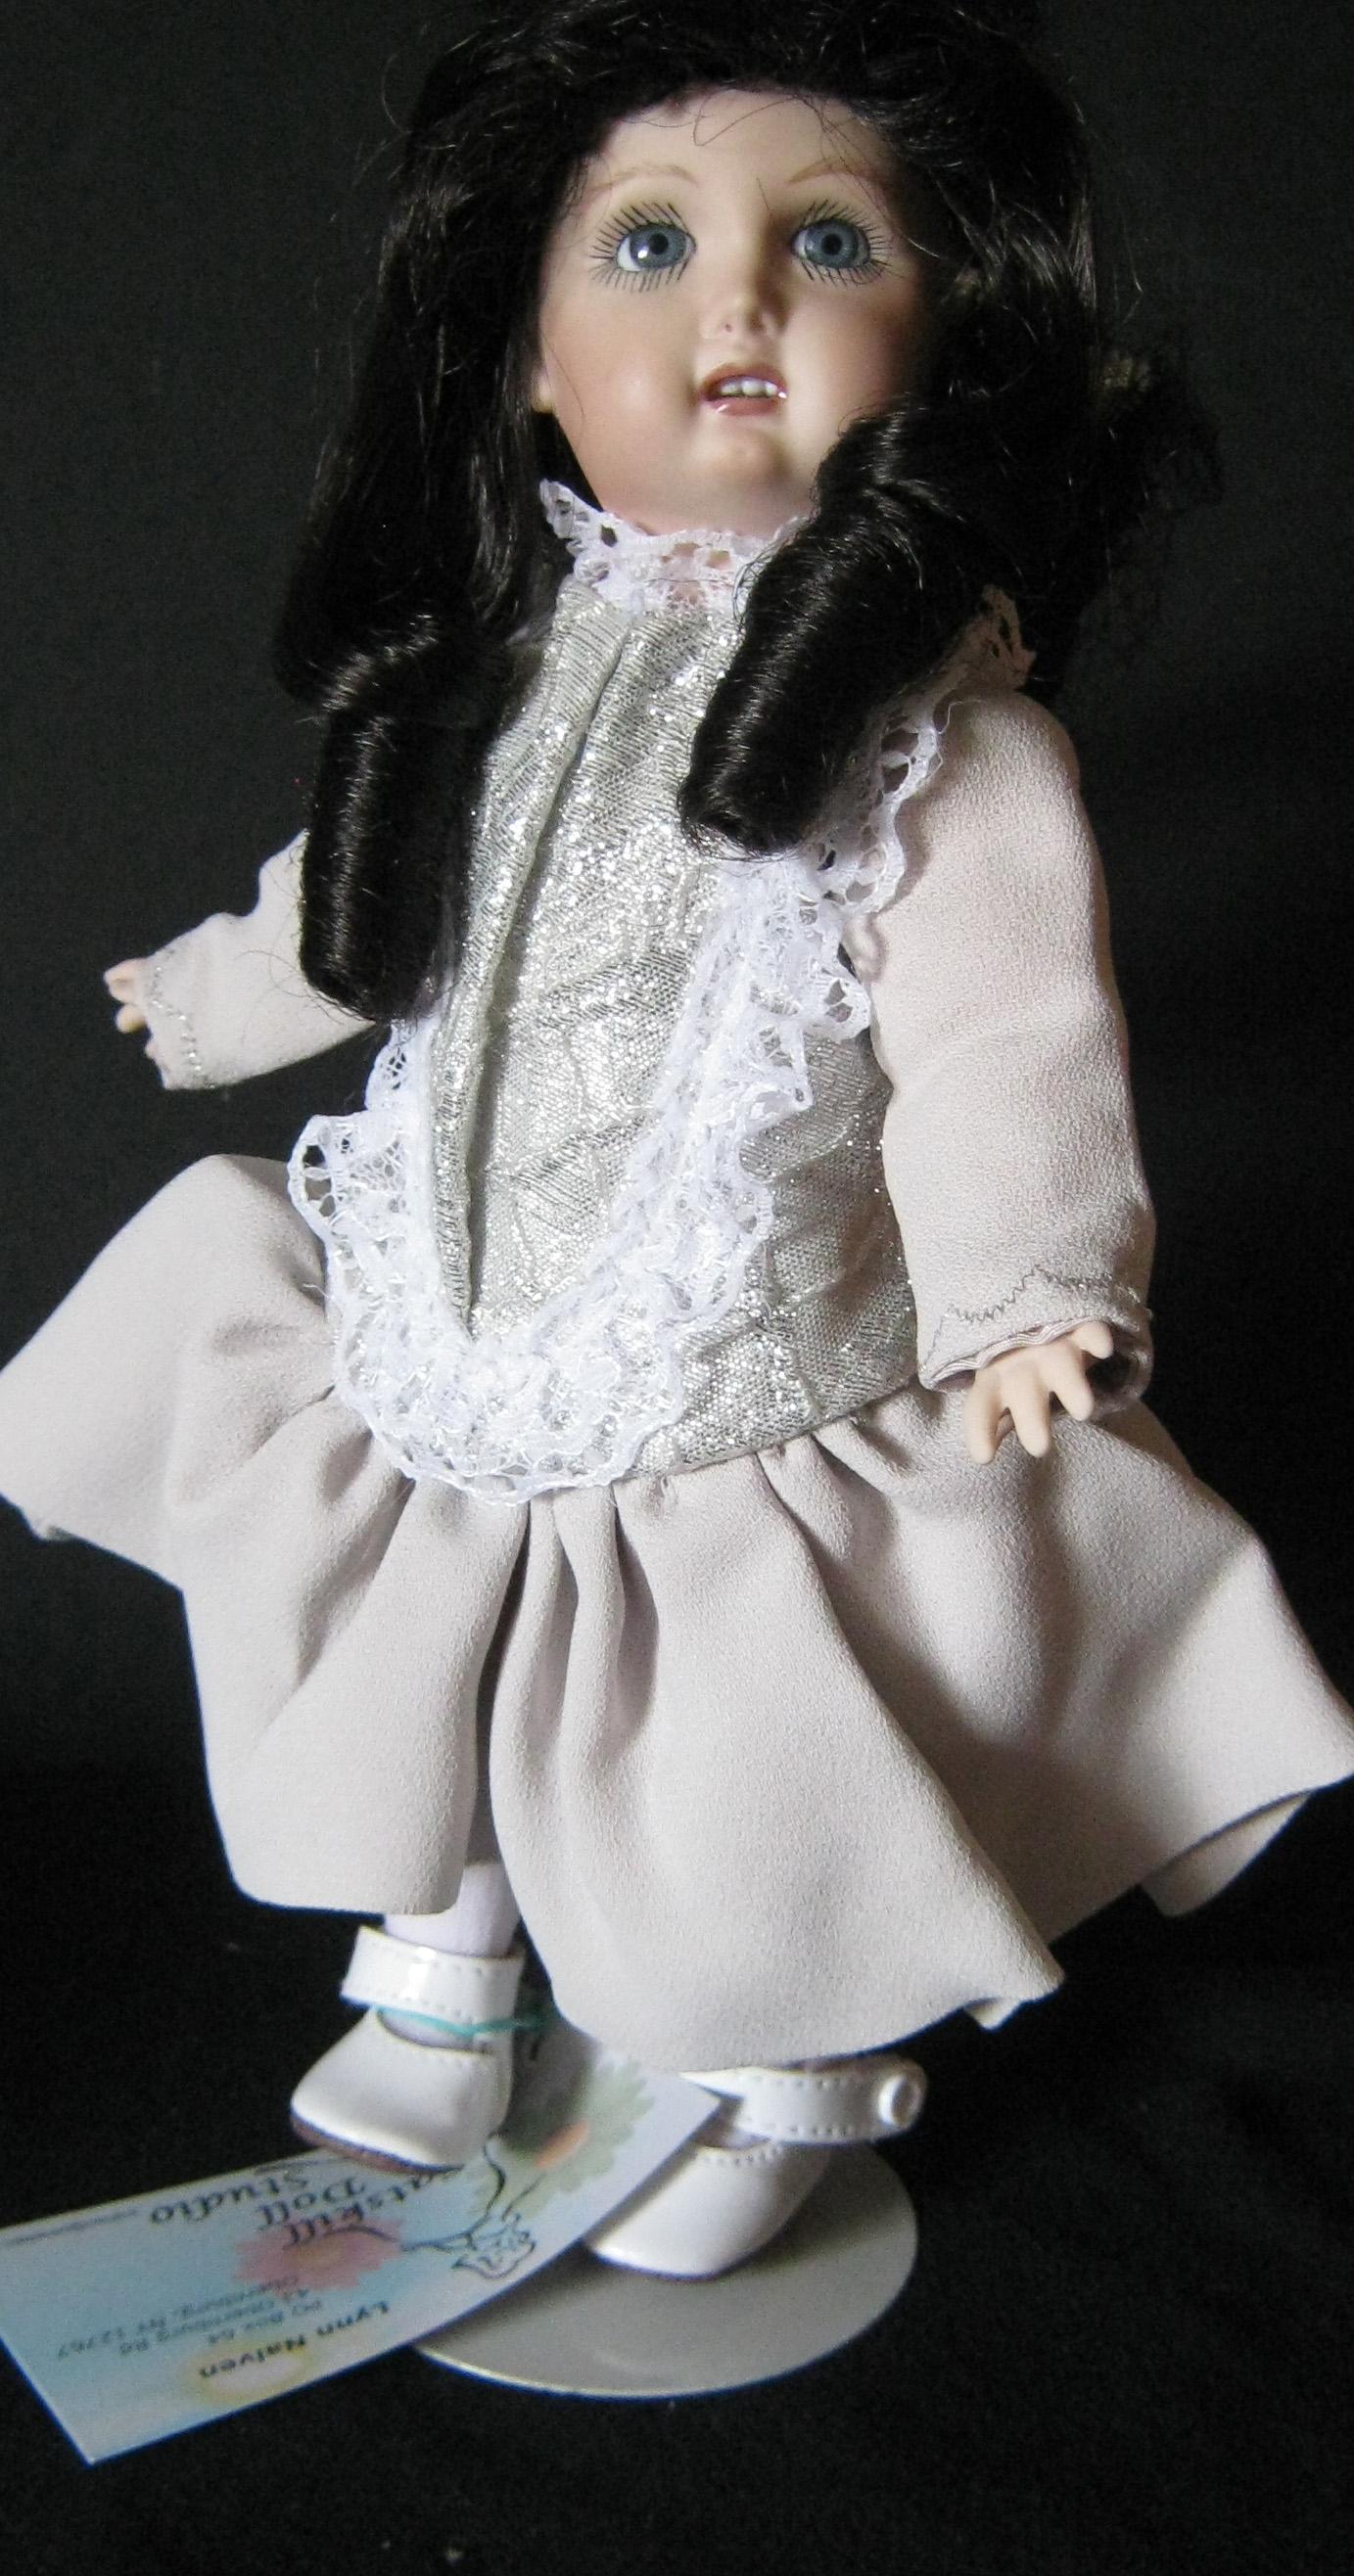 Porcelain Dolls | Catskill Dolls